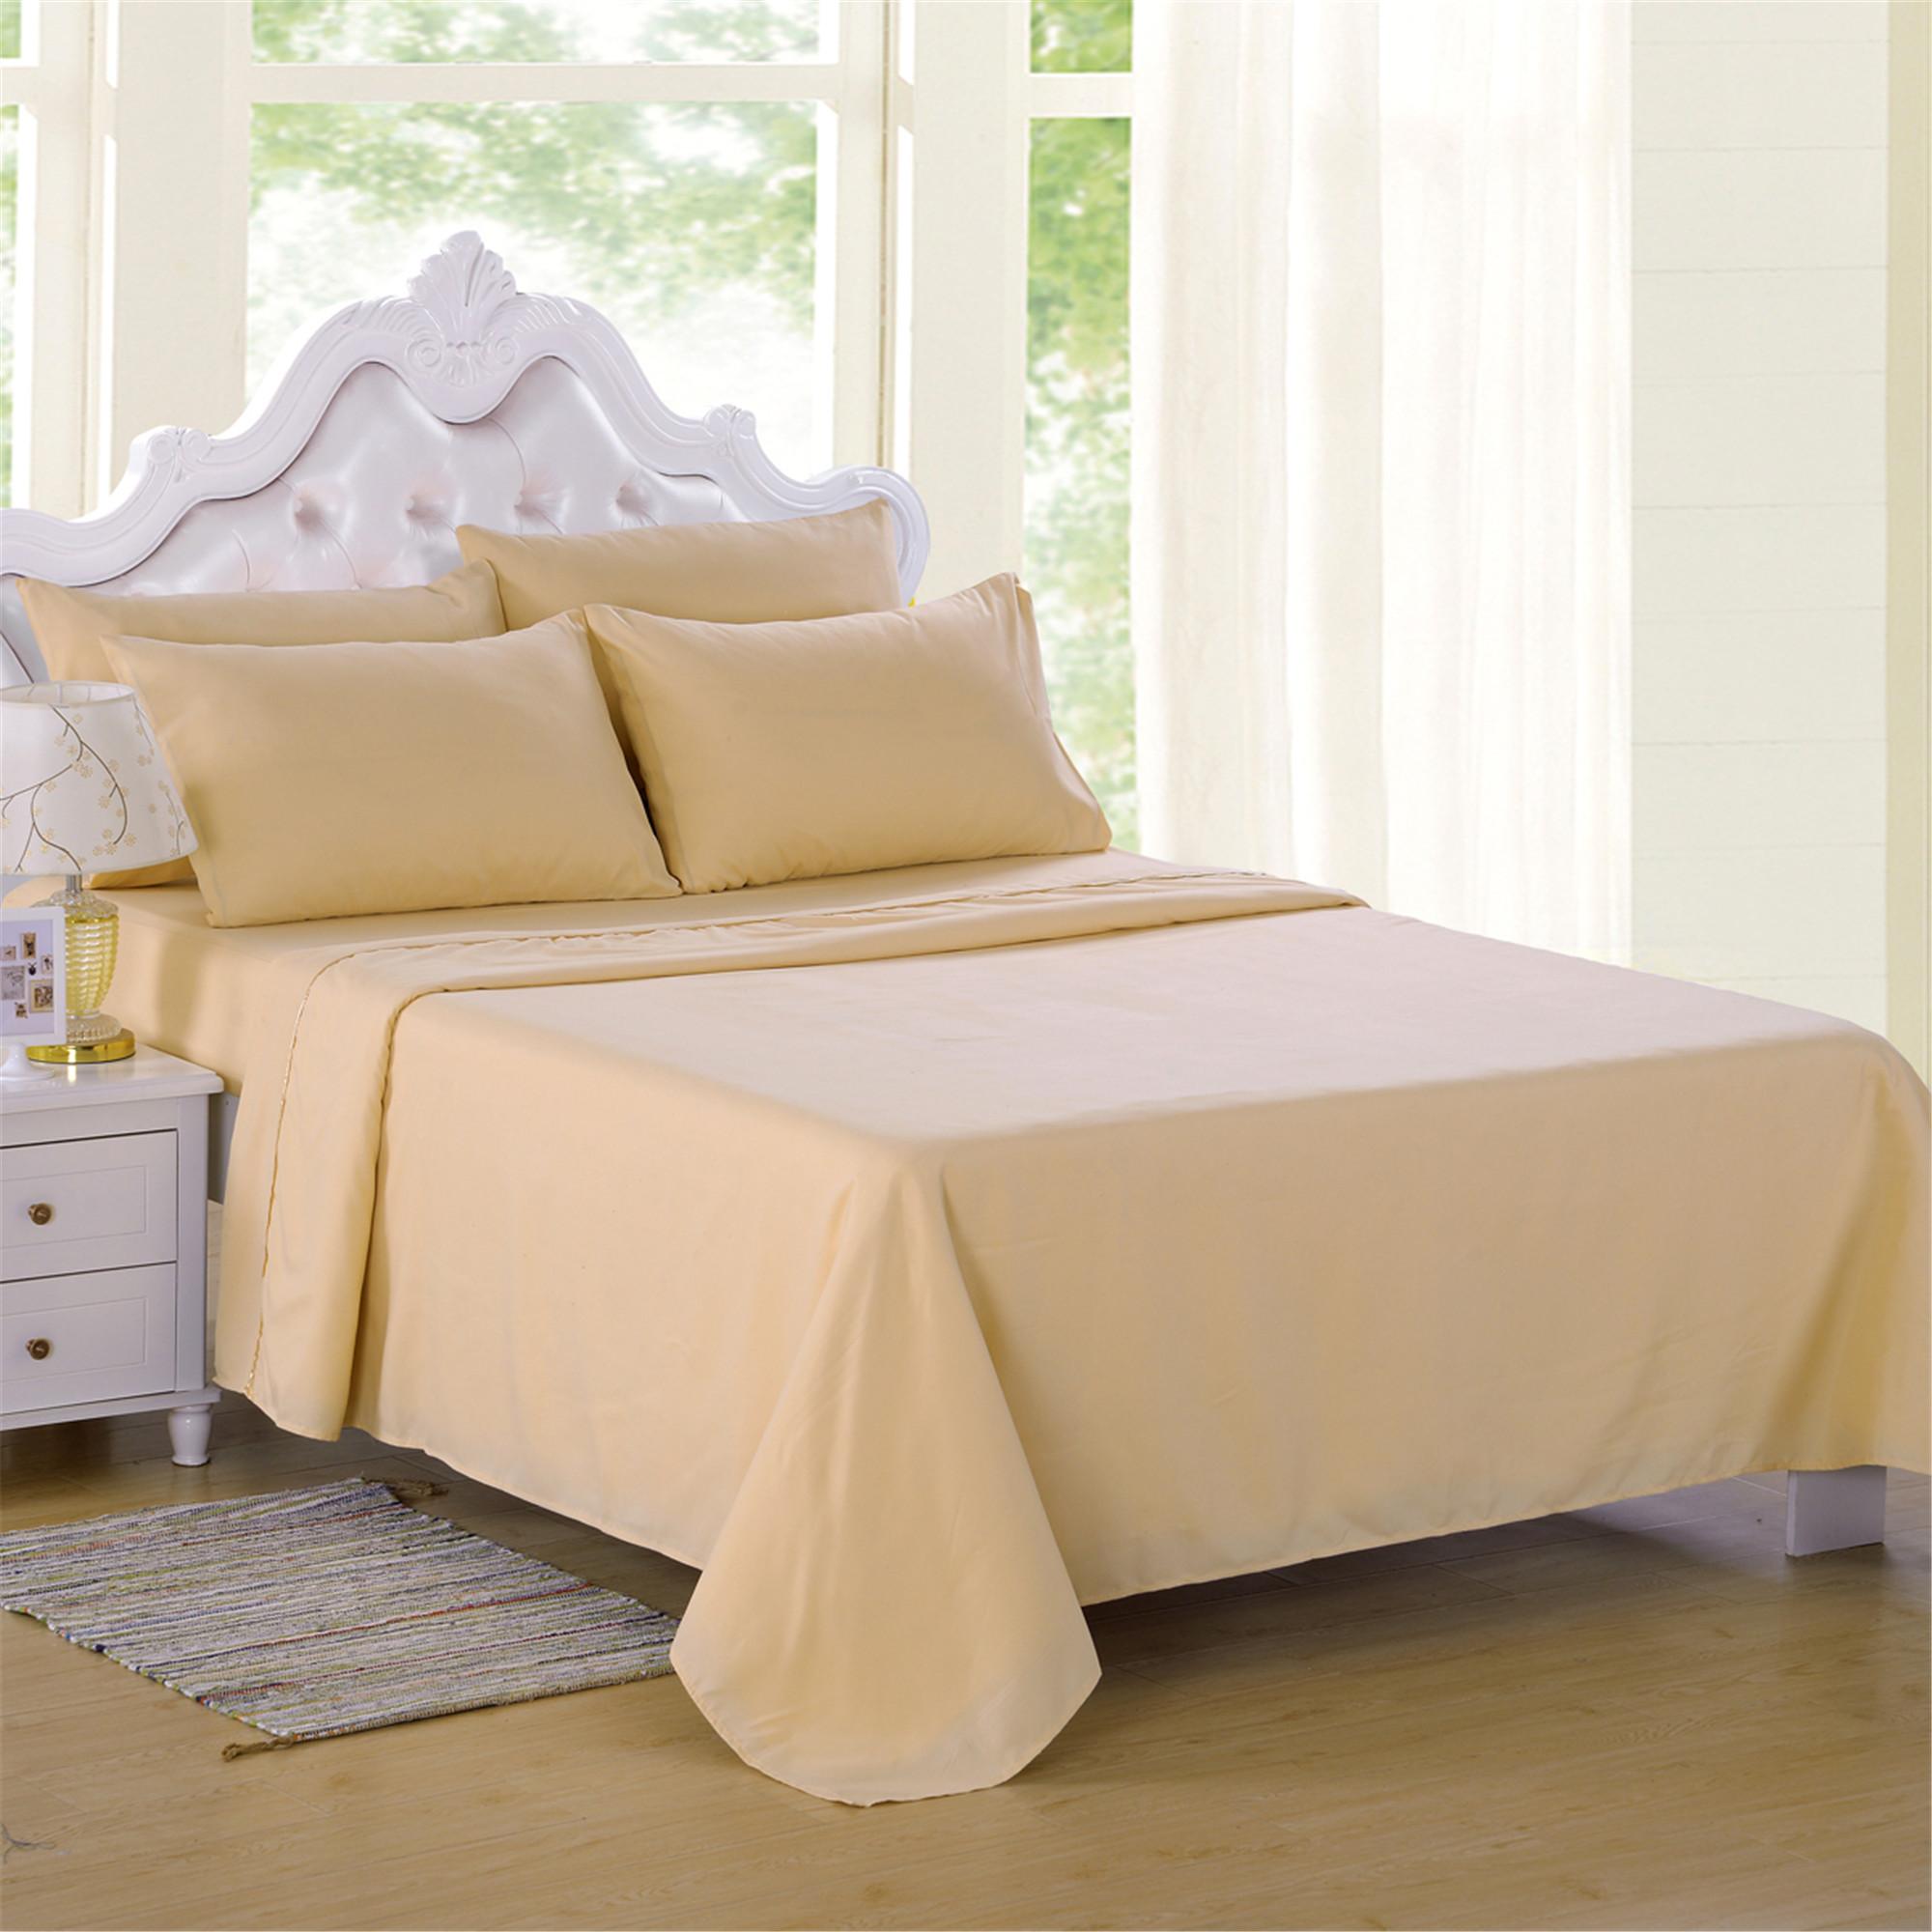 Soft Microfiber 3000TC 6 Piece Bed Sheet Set Deep Pocket For Queen Bed ,Wrinkle & Fade Resistant Solid Burgundy